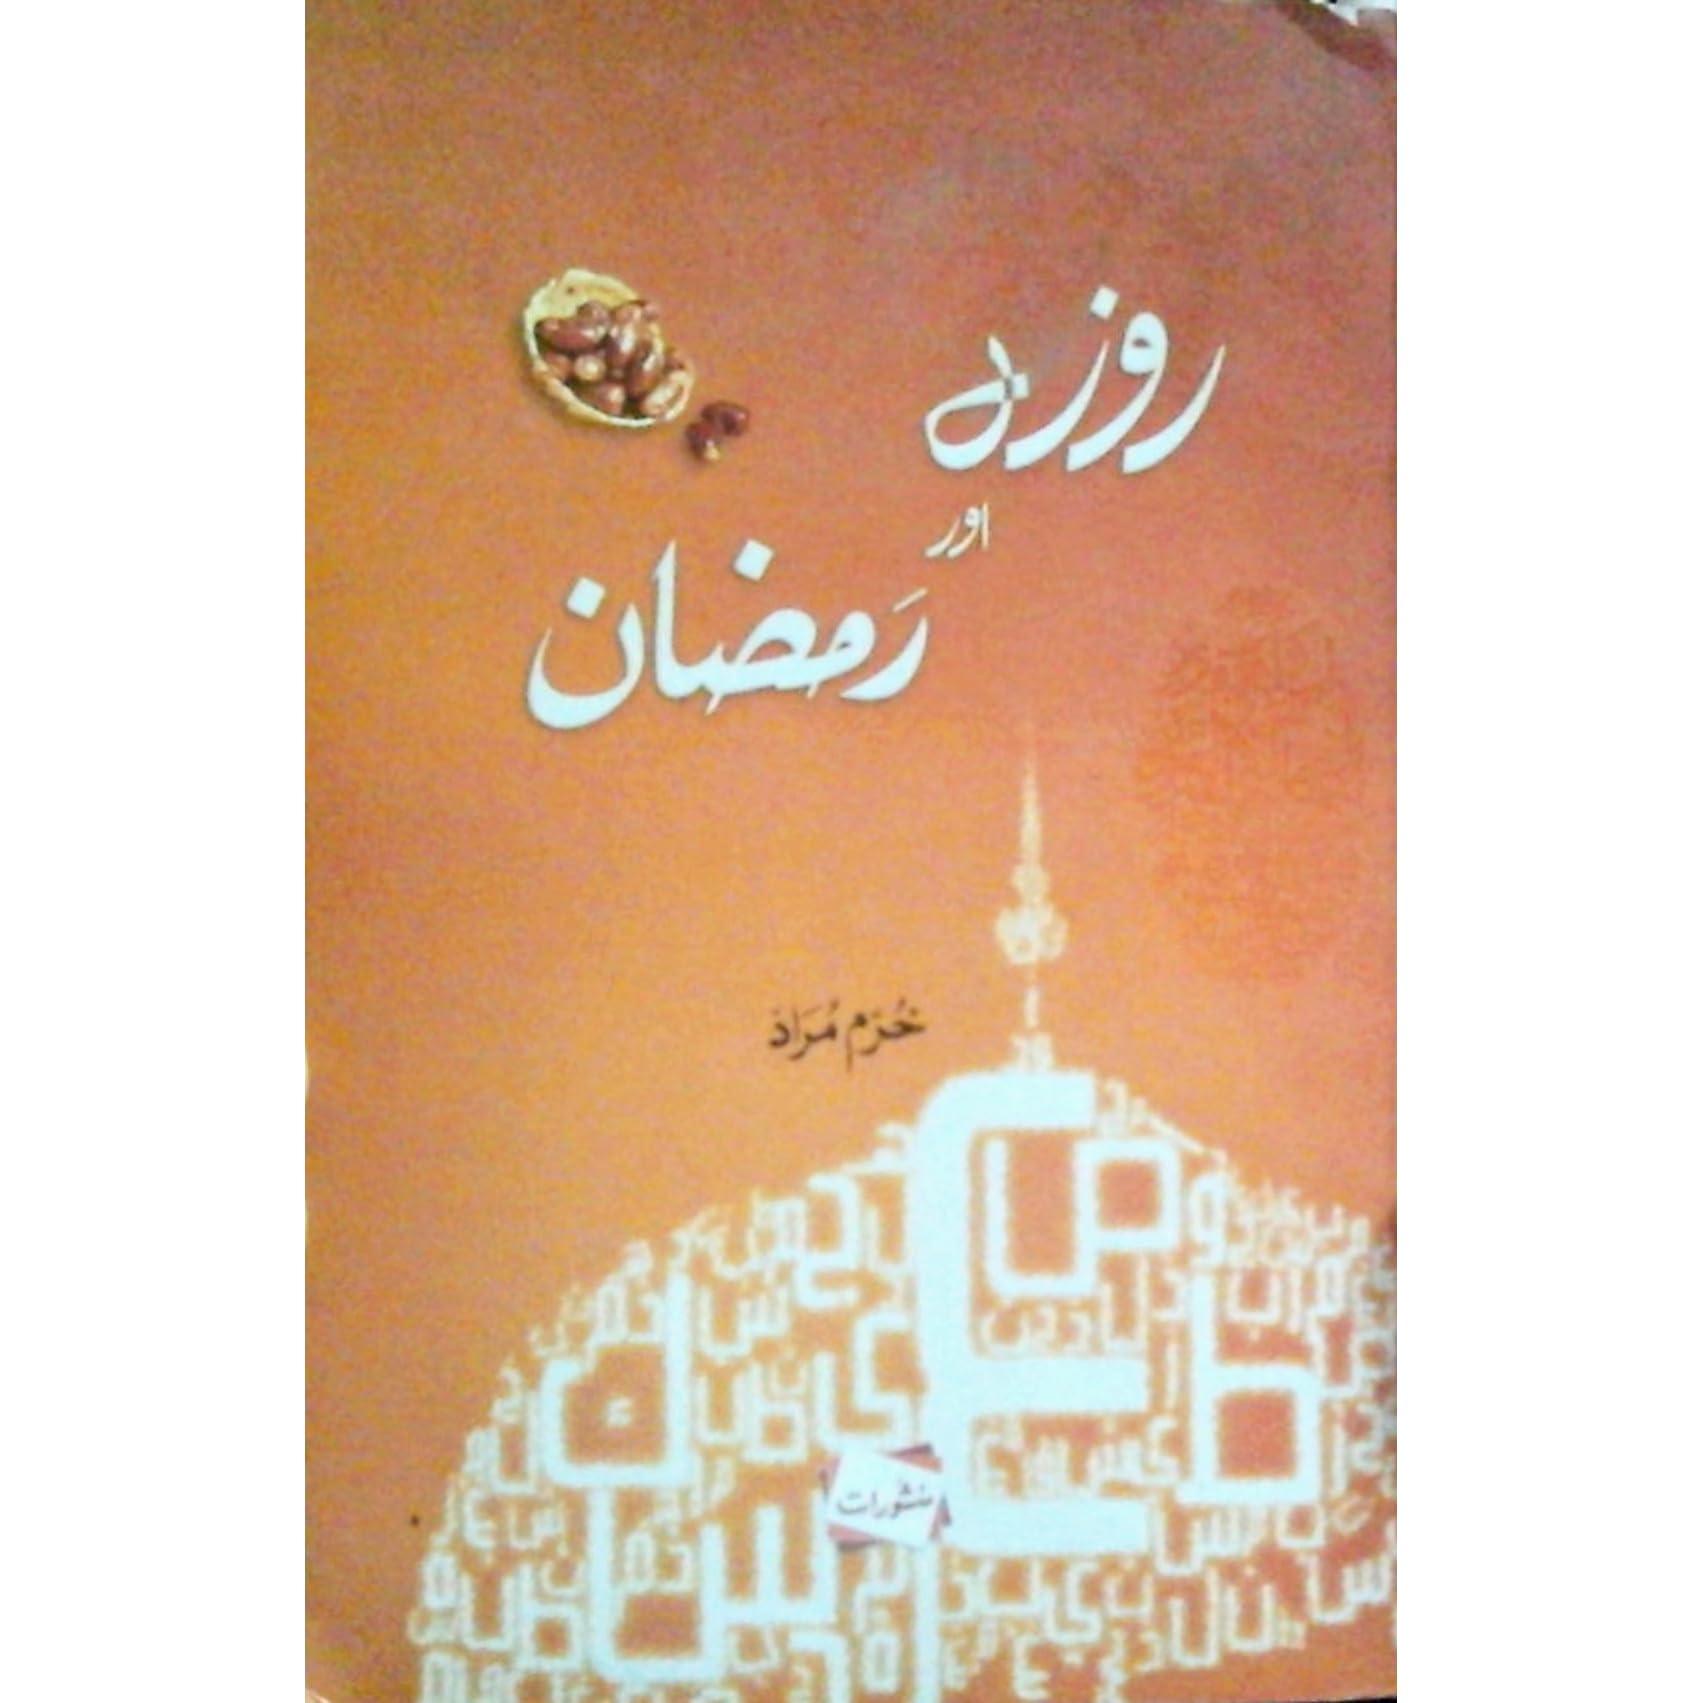 Fasting and Ramadan/ روزہ اور رمضان by Khurram Murad